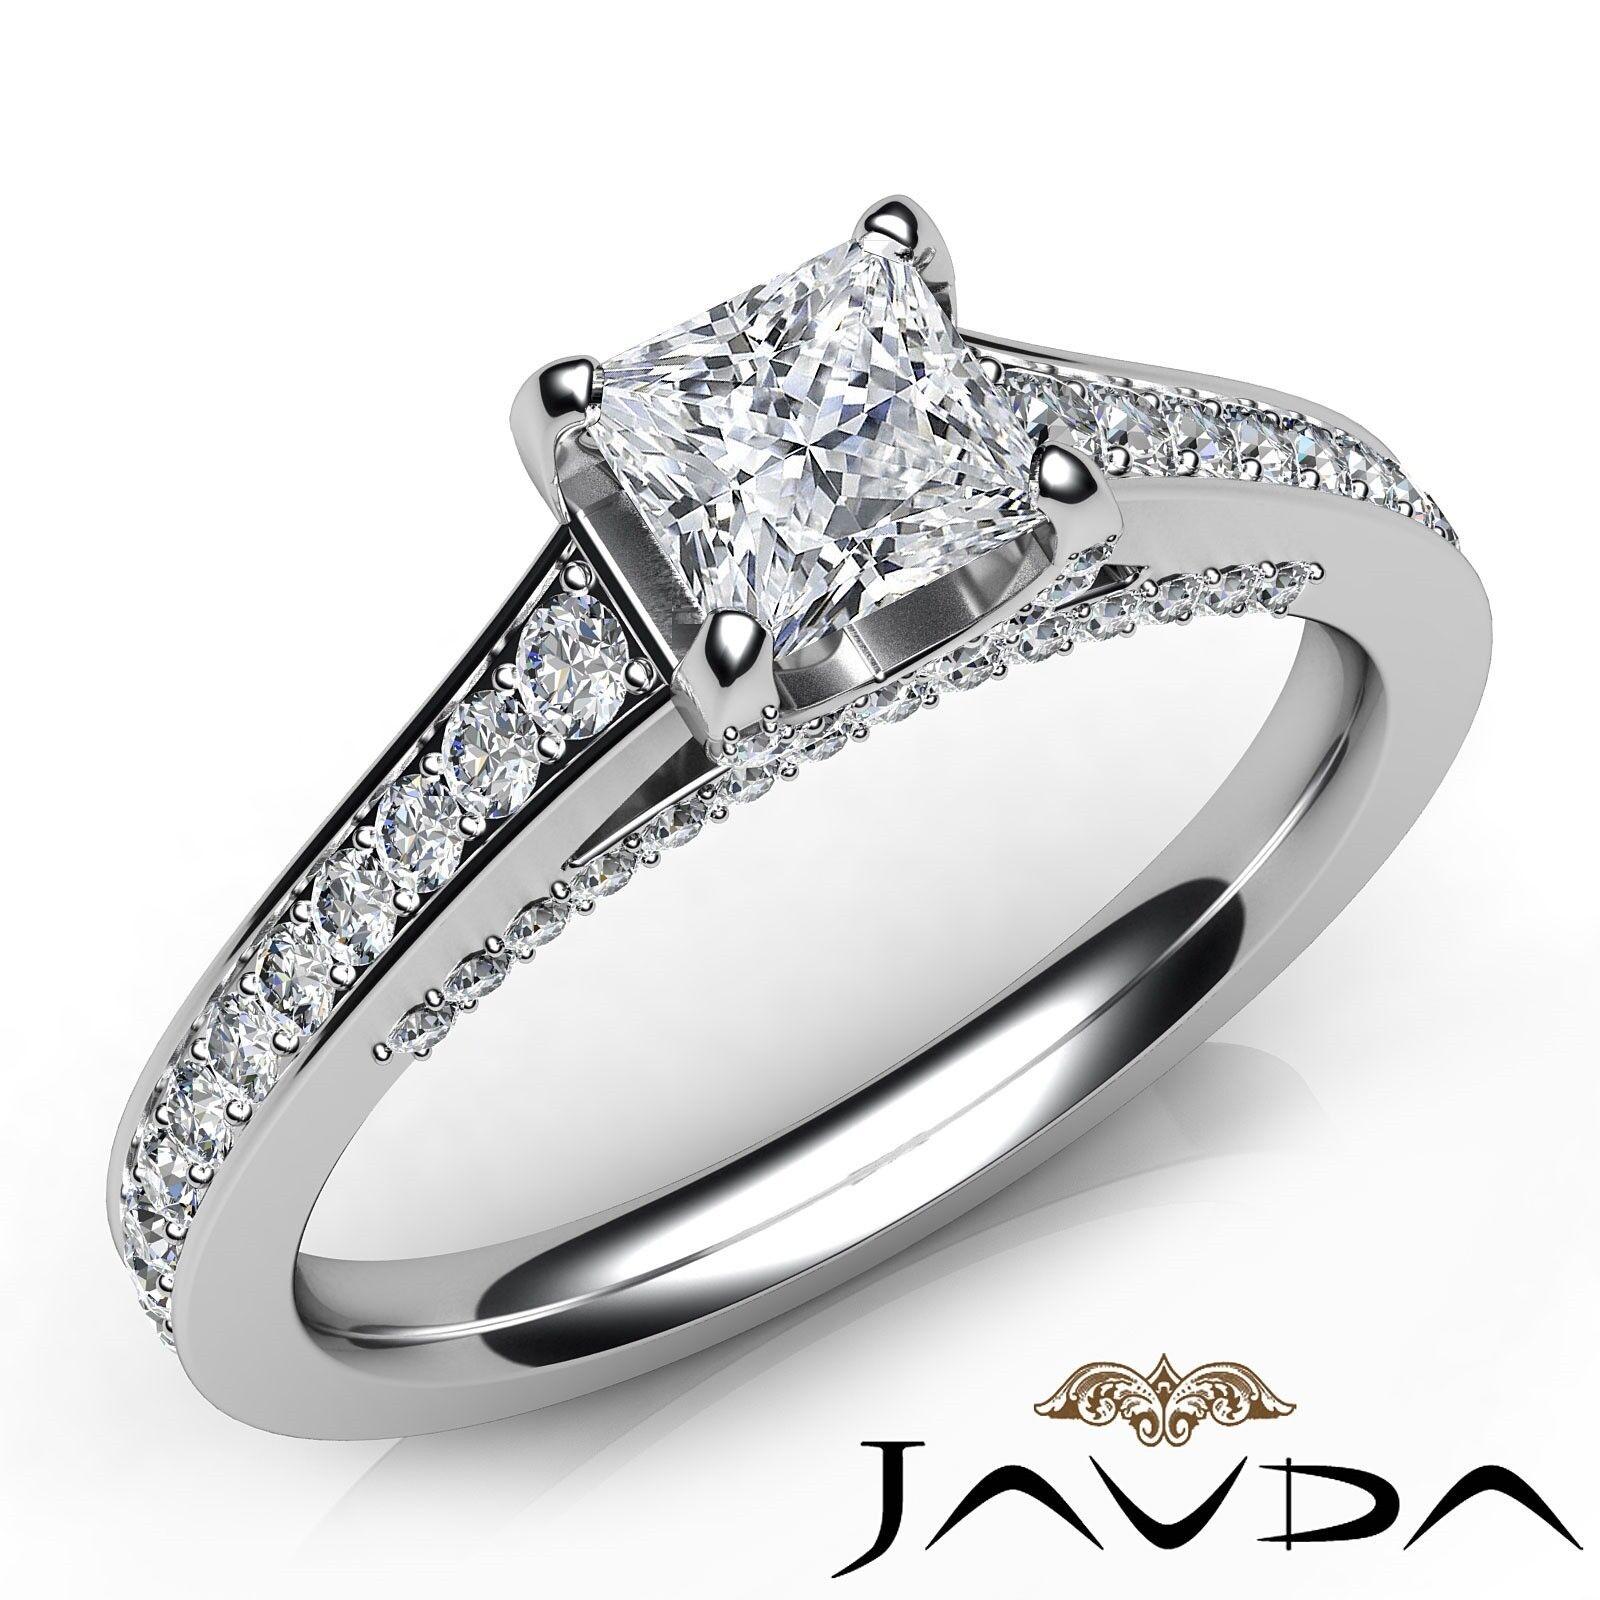 1.75ctw Natural 100% Princess Diamond Engagement Ring GIA F-VS1 White Gold Rings